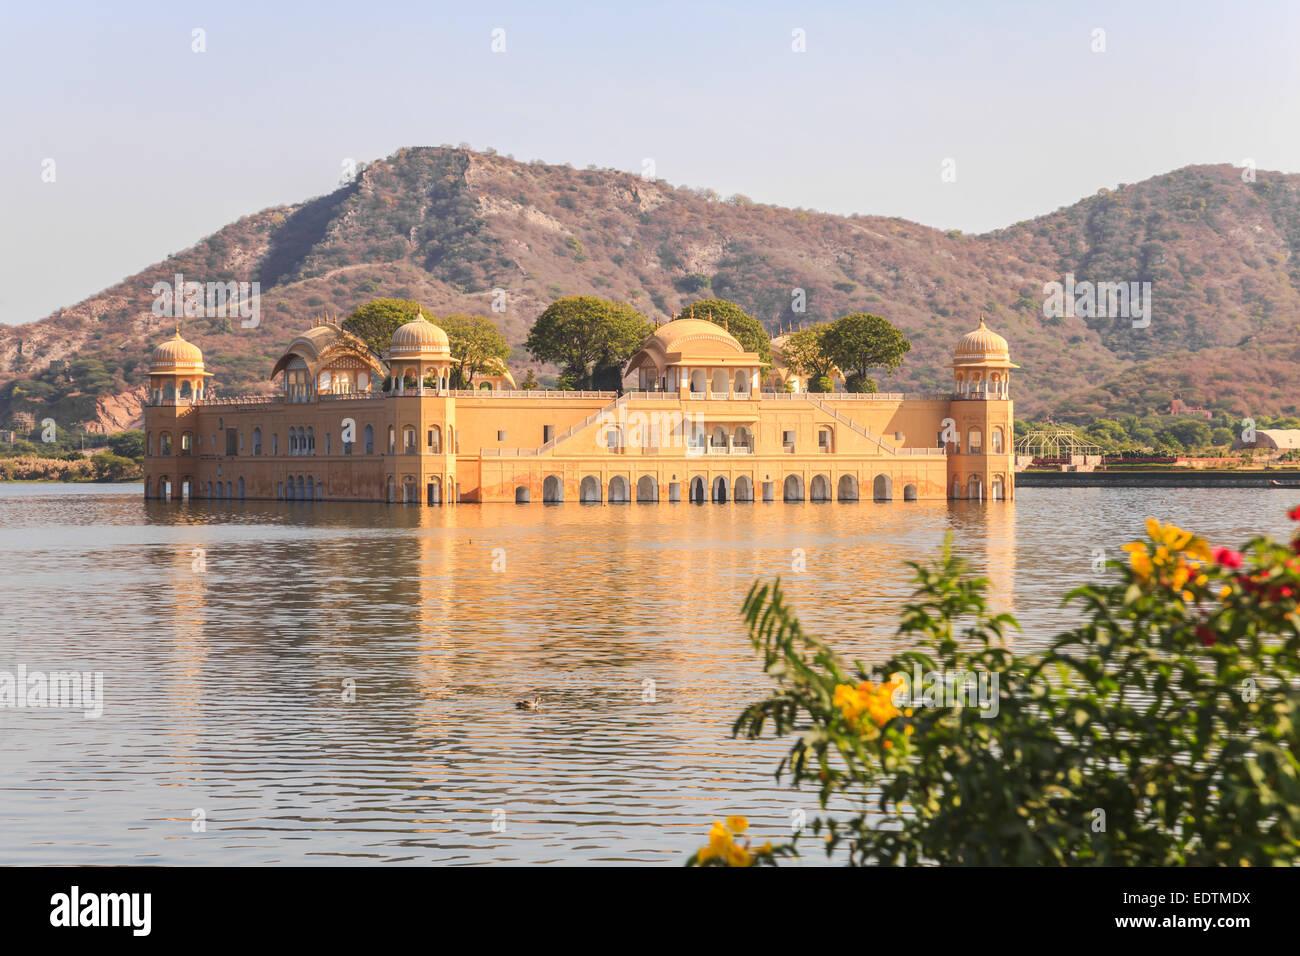 Jal Mahal di Jaipur, nel palazzo d'acqua nell'uomo Sagar Lago, Rajasthan, India Immagini Stock